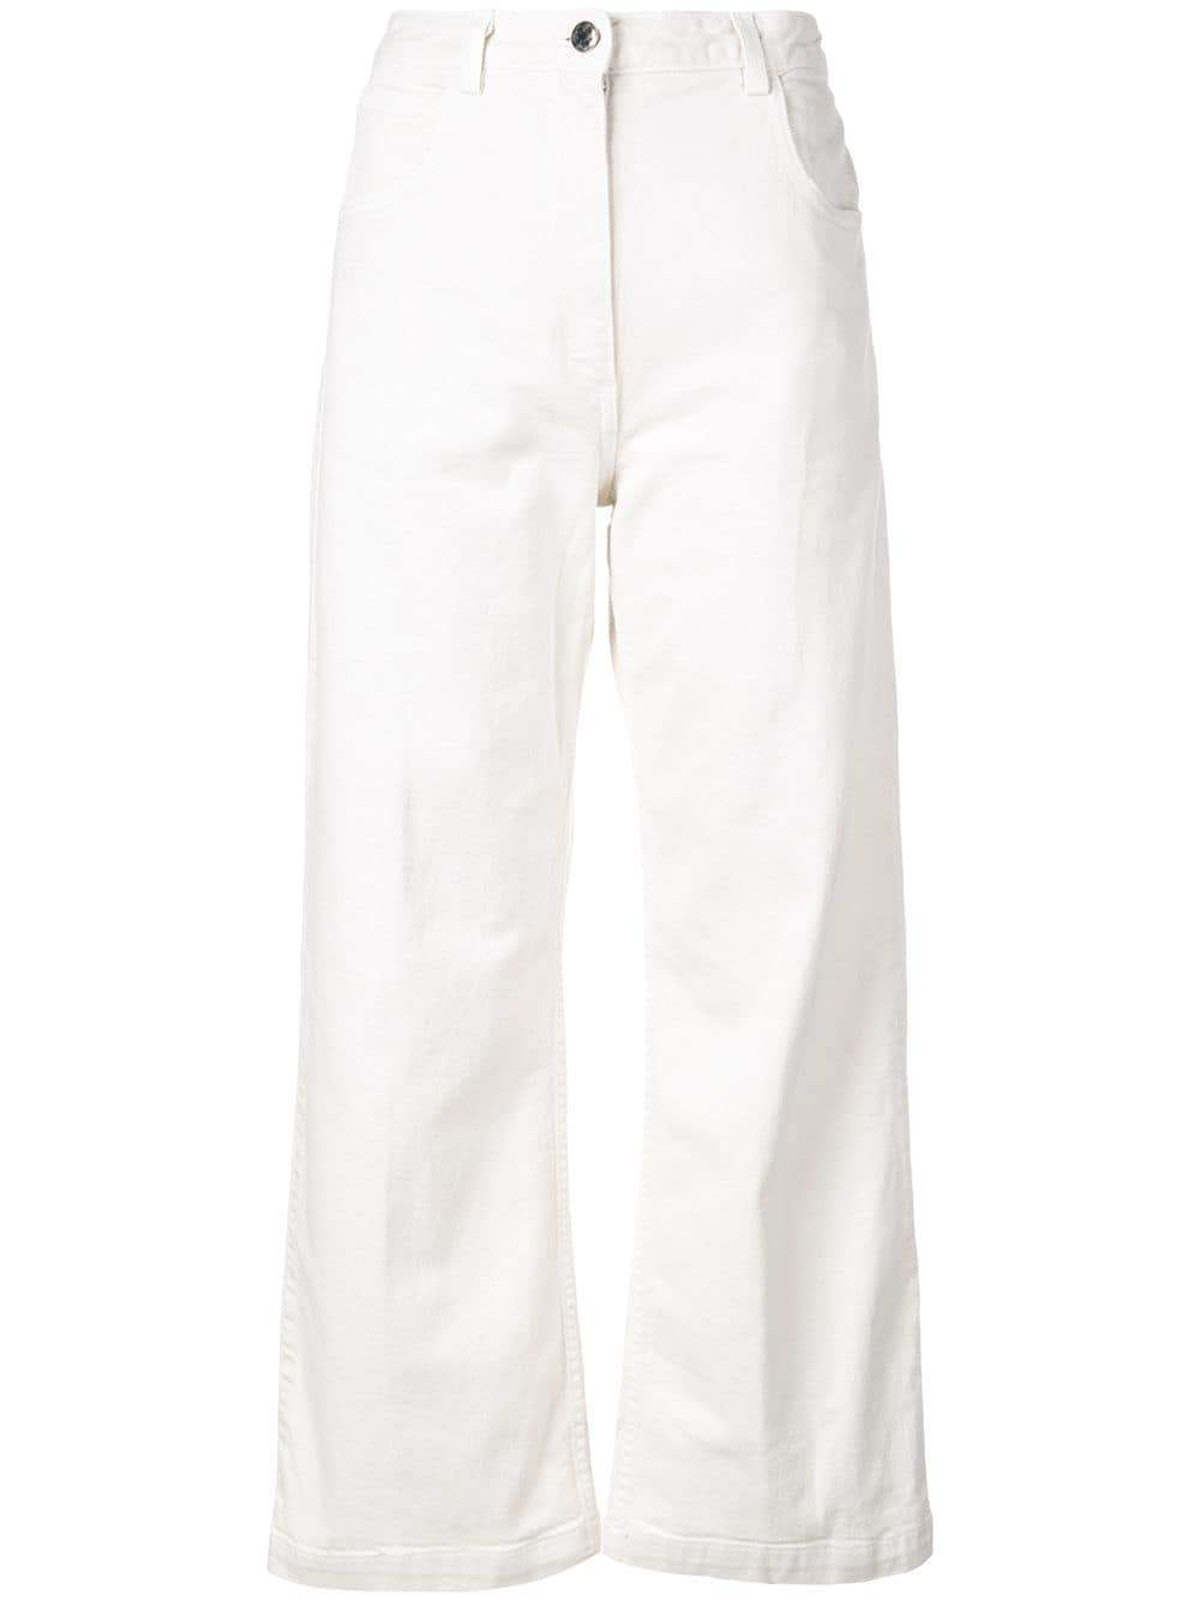 Pennon Pants